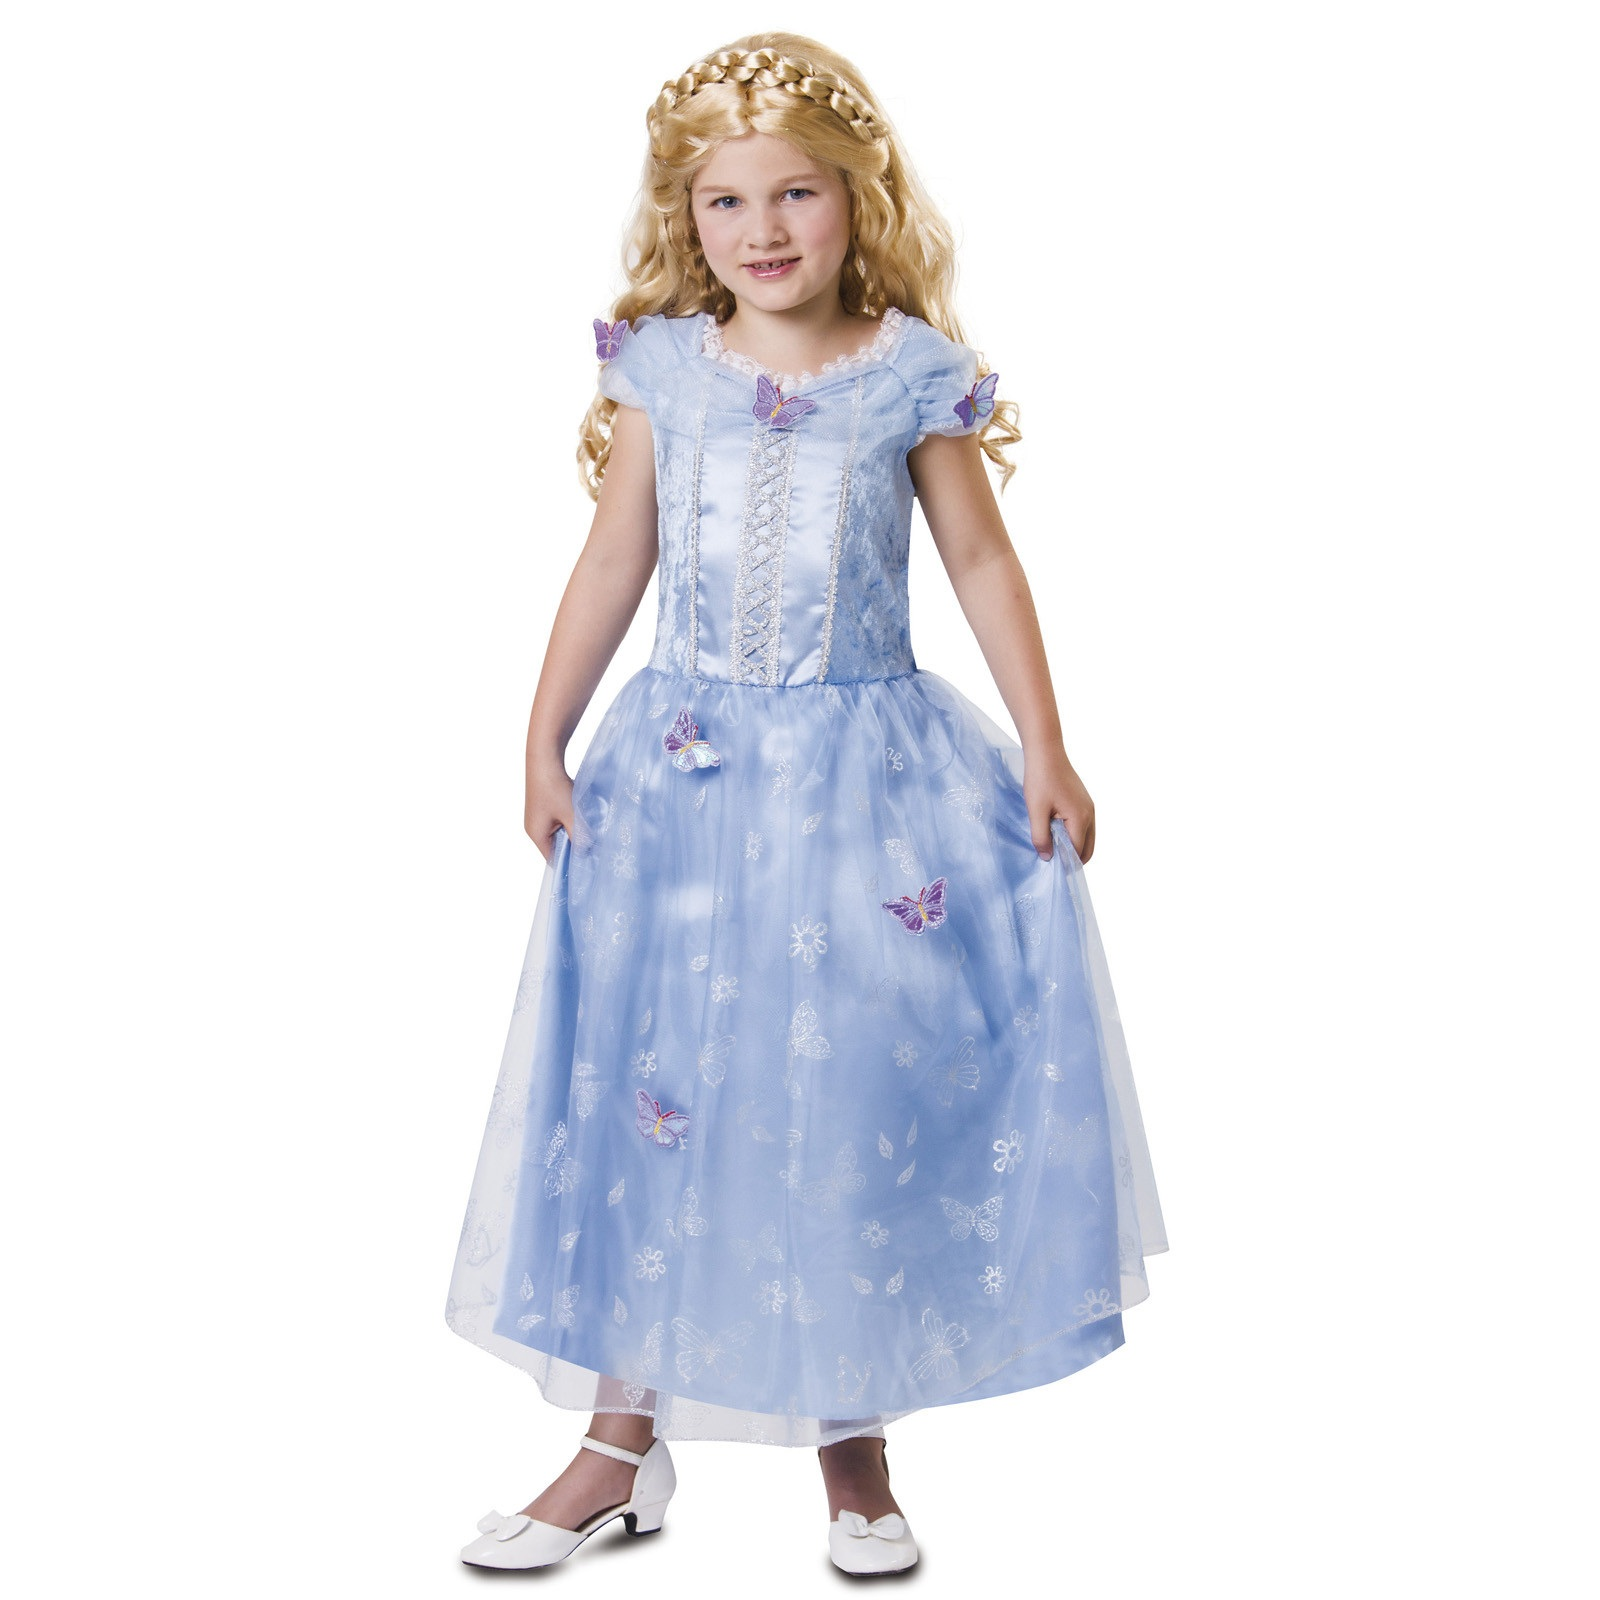 disfraz princesa mariposas niña 203180mom - DISFRAZ PRINCESA MARIPOSAS NIÑA